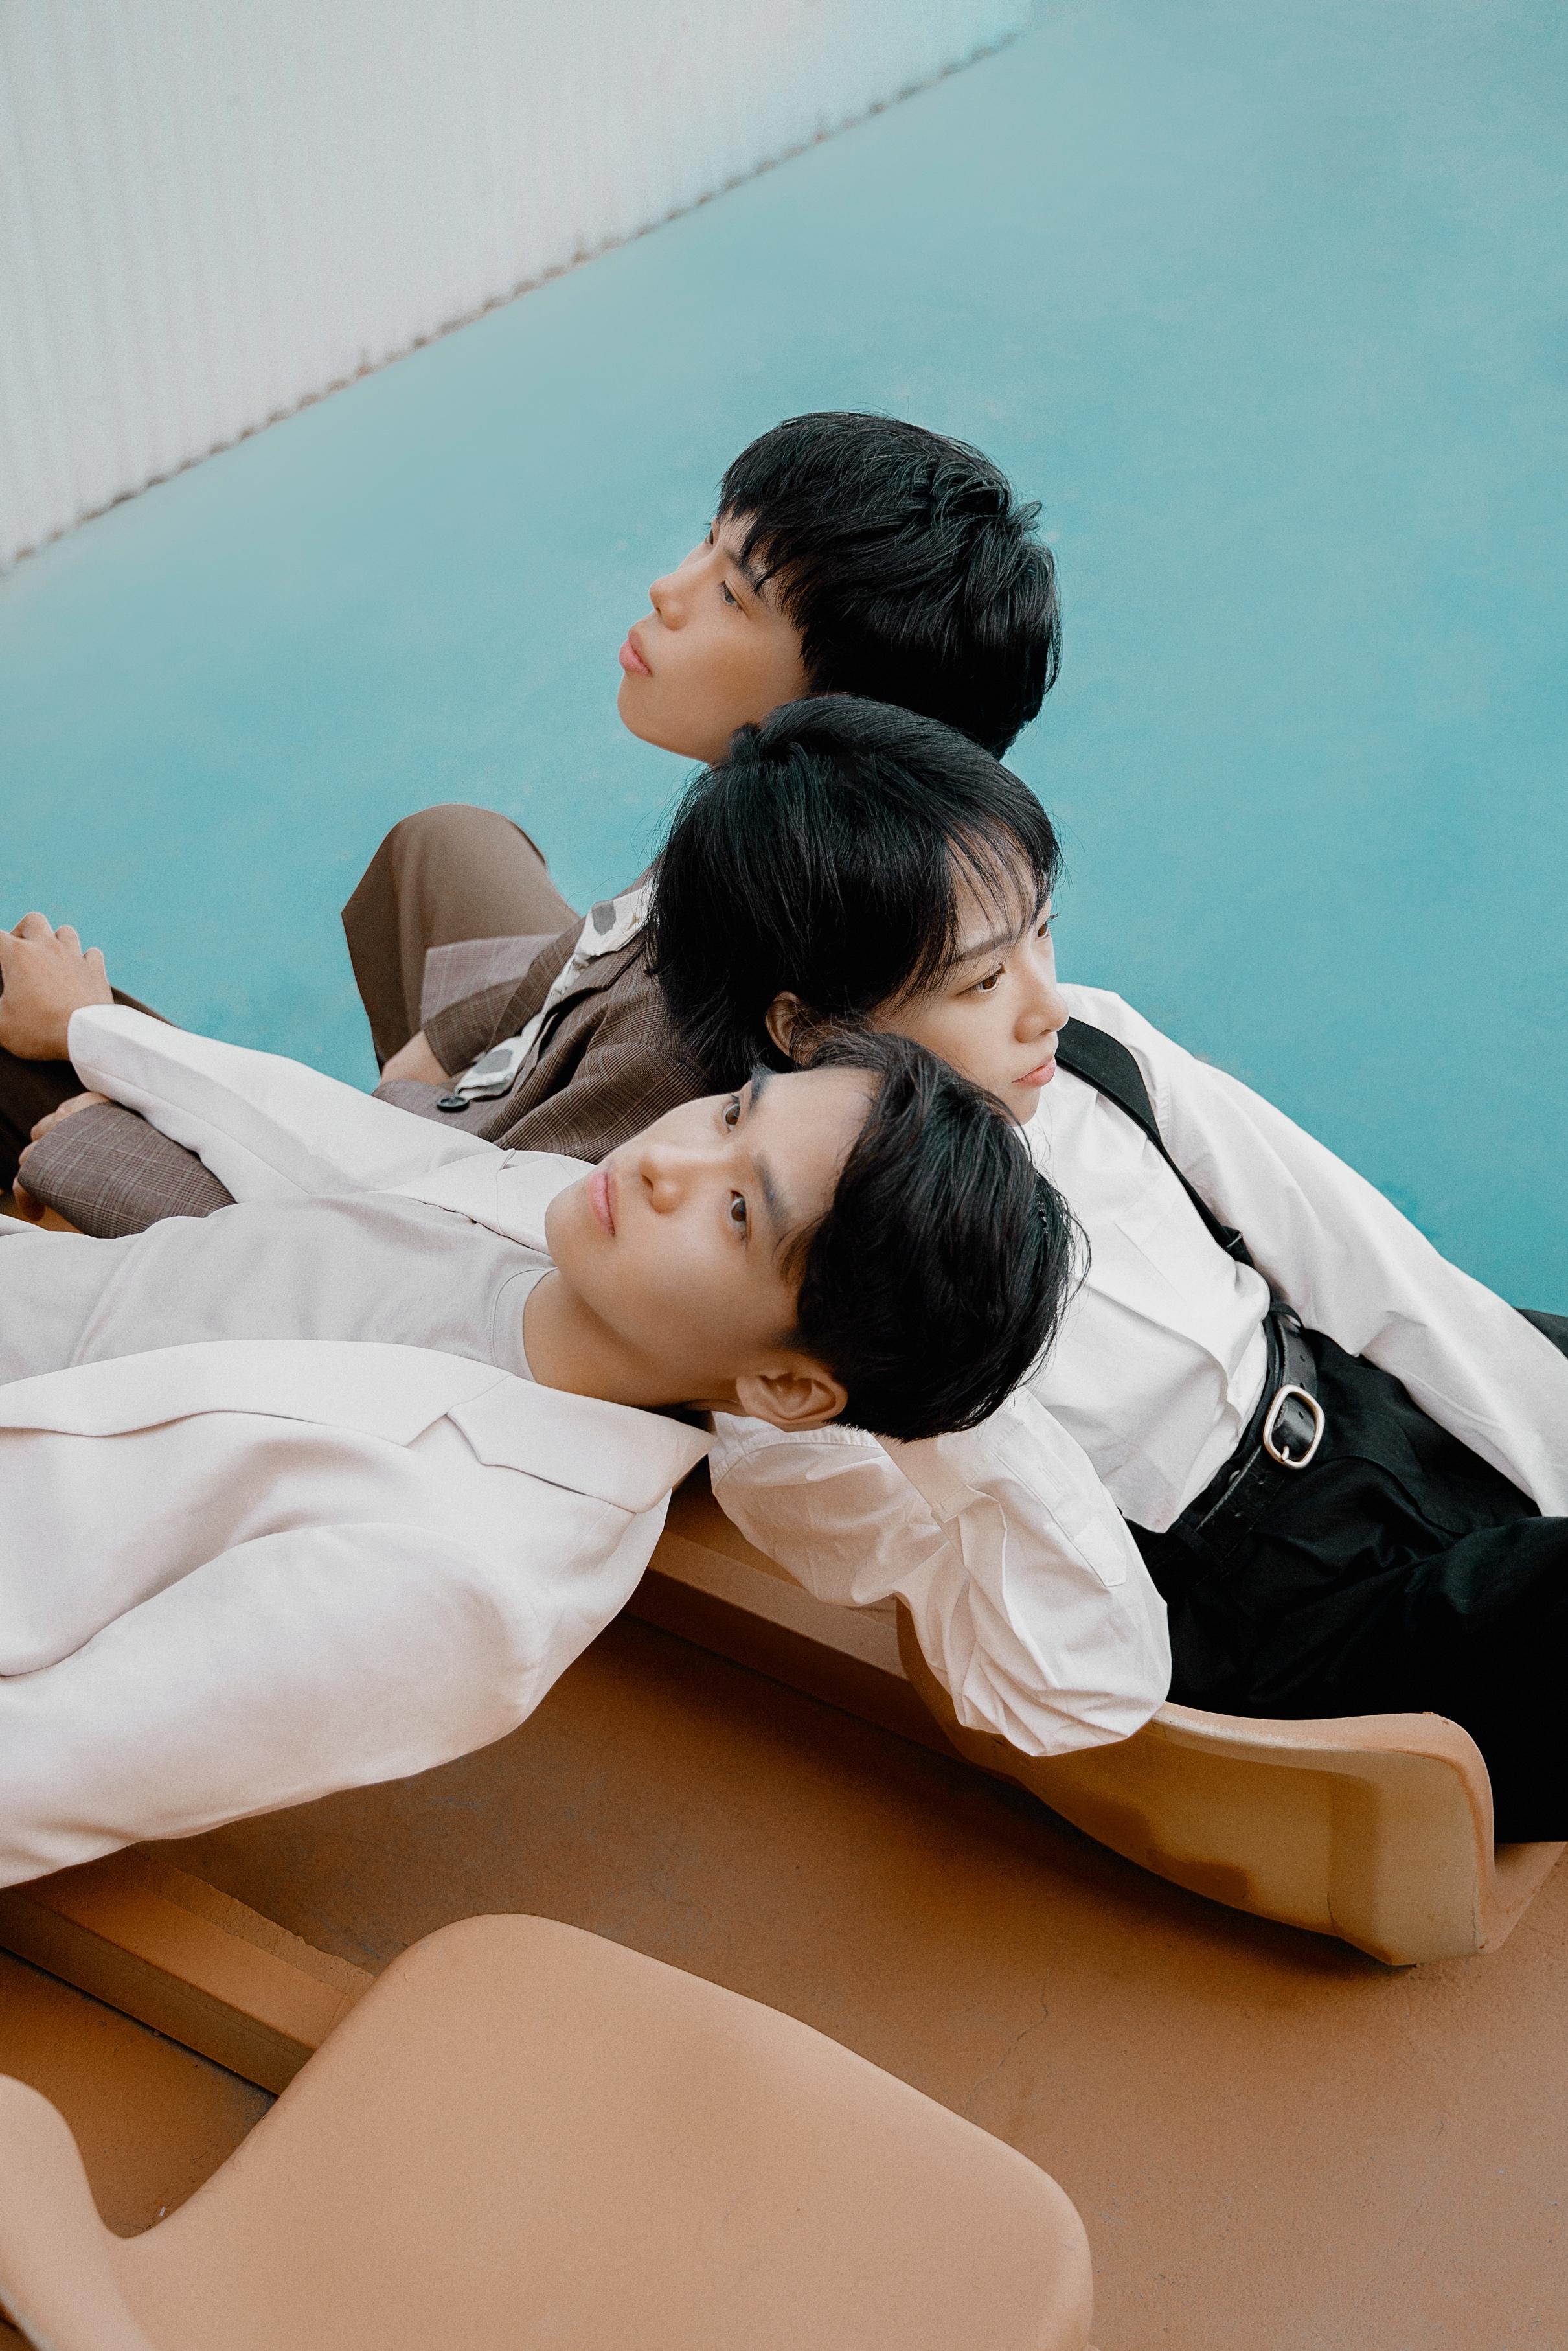 【上海站】热夏Hot Summer「有放热YouFunUp X 与她」联合呈现LVH